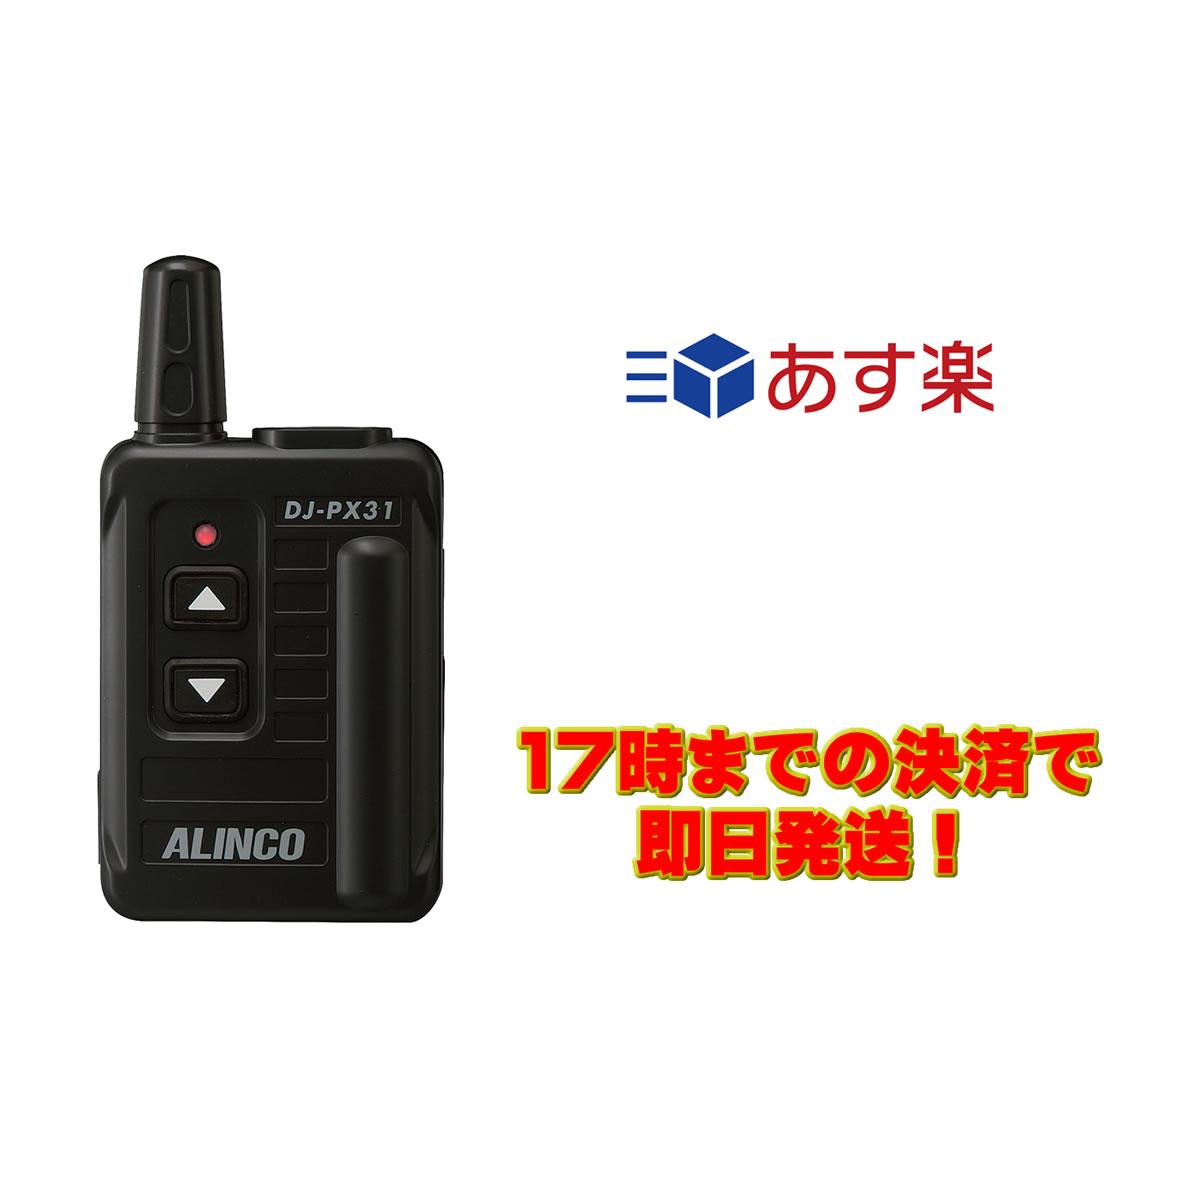 DJ-PX31(B) 47ch 中継対応 超小型 特定小電力トランシーバー